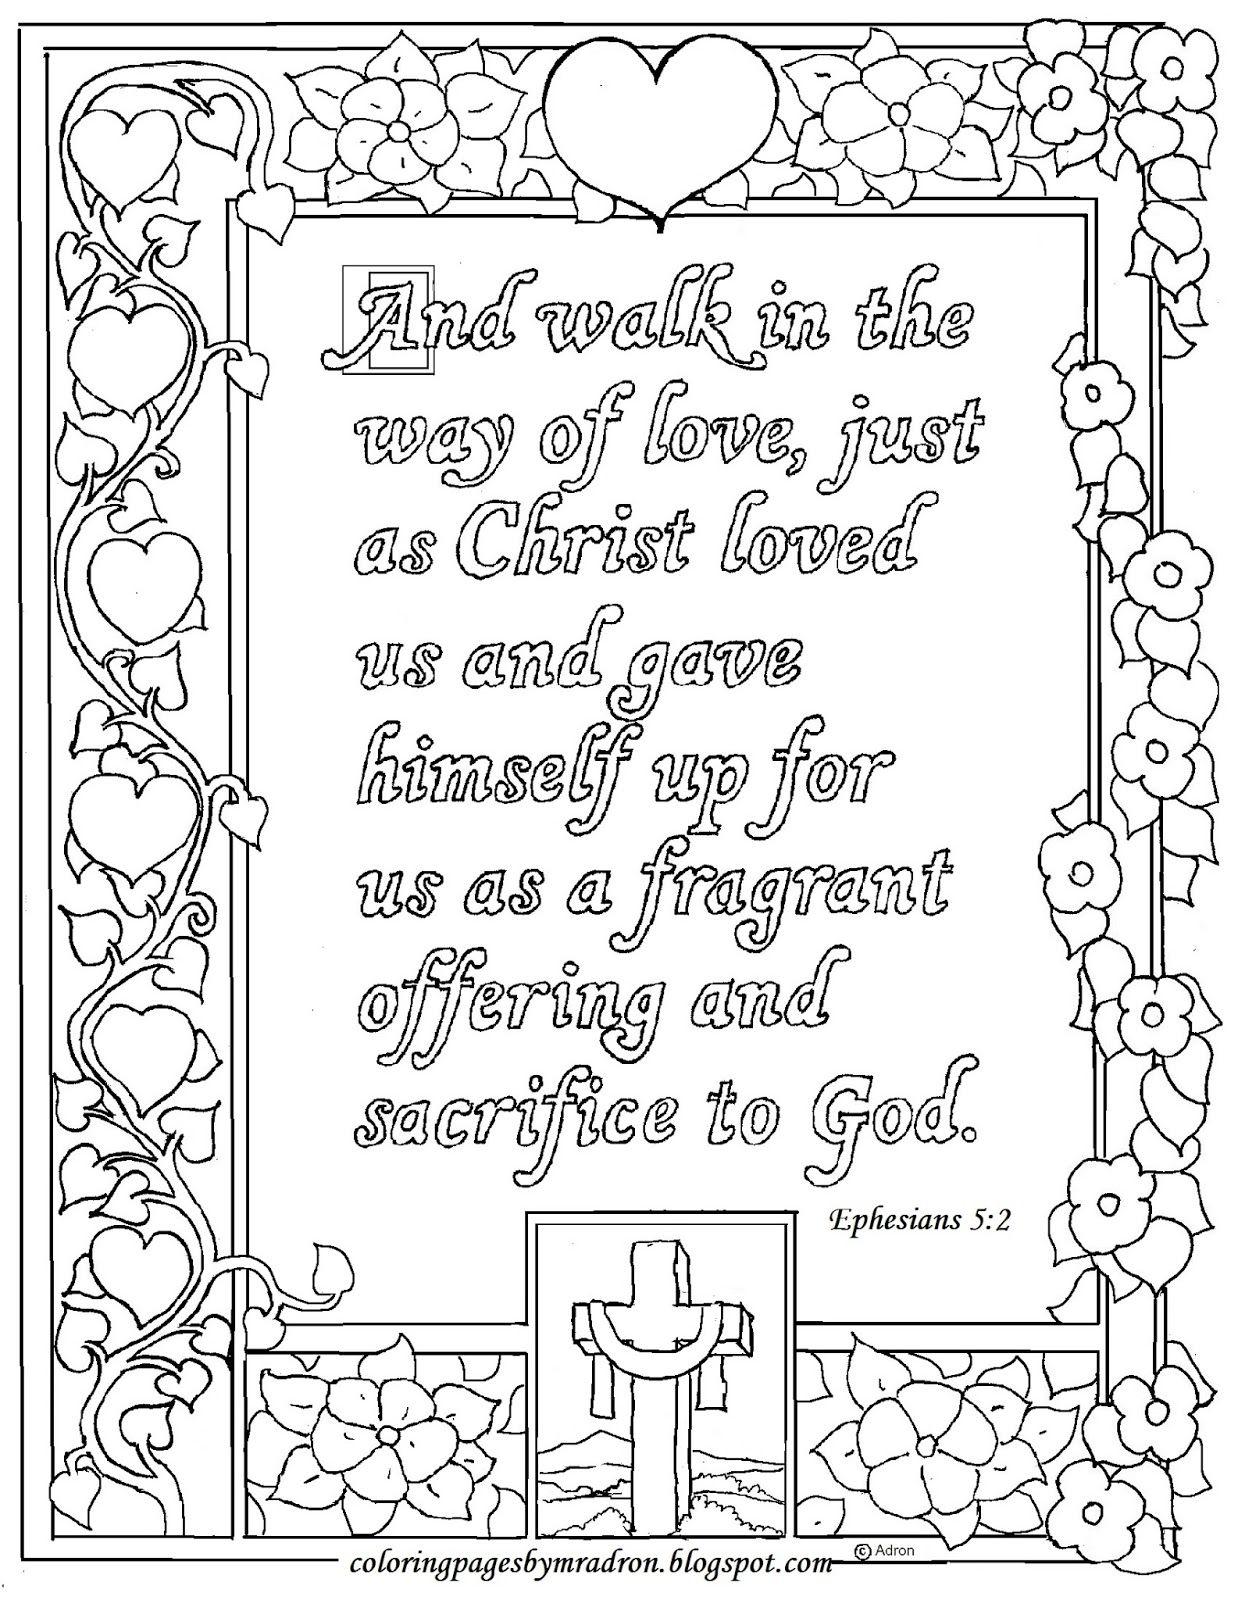 Ephesians 5 2 Jpg 1 238 1 600 Pixels Ephesians Bible School